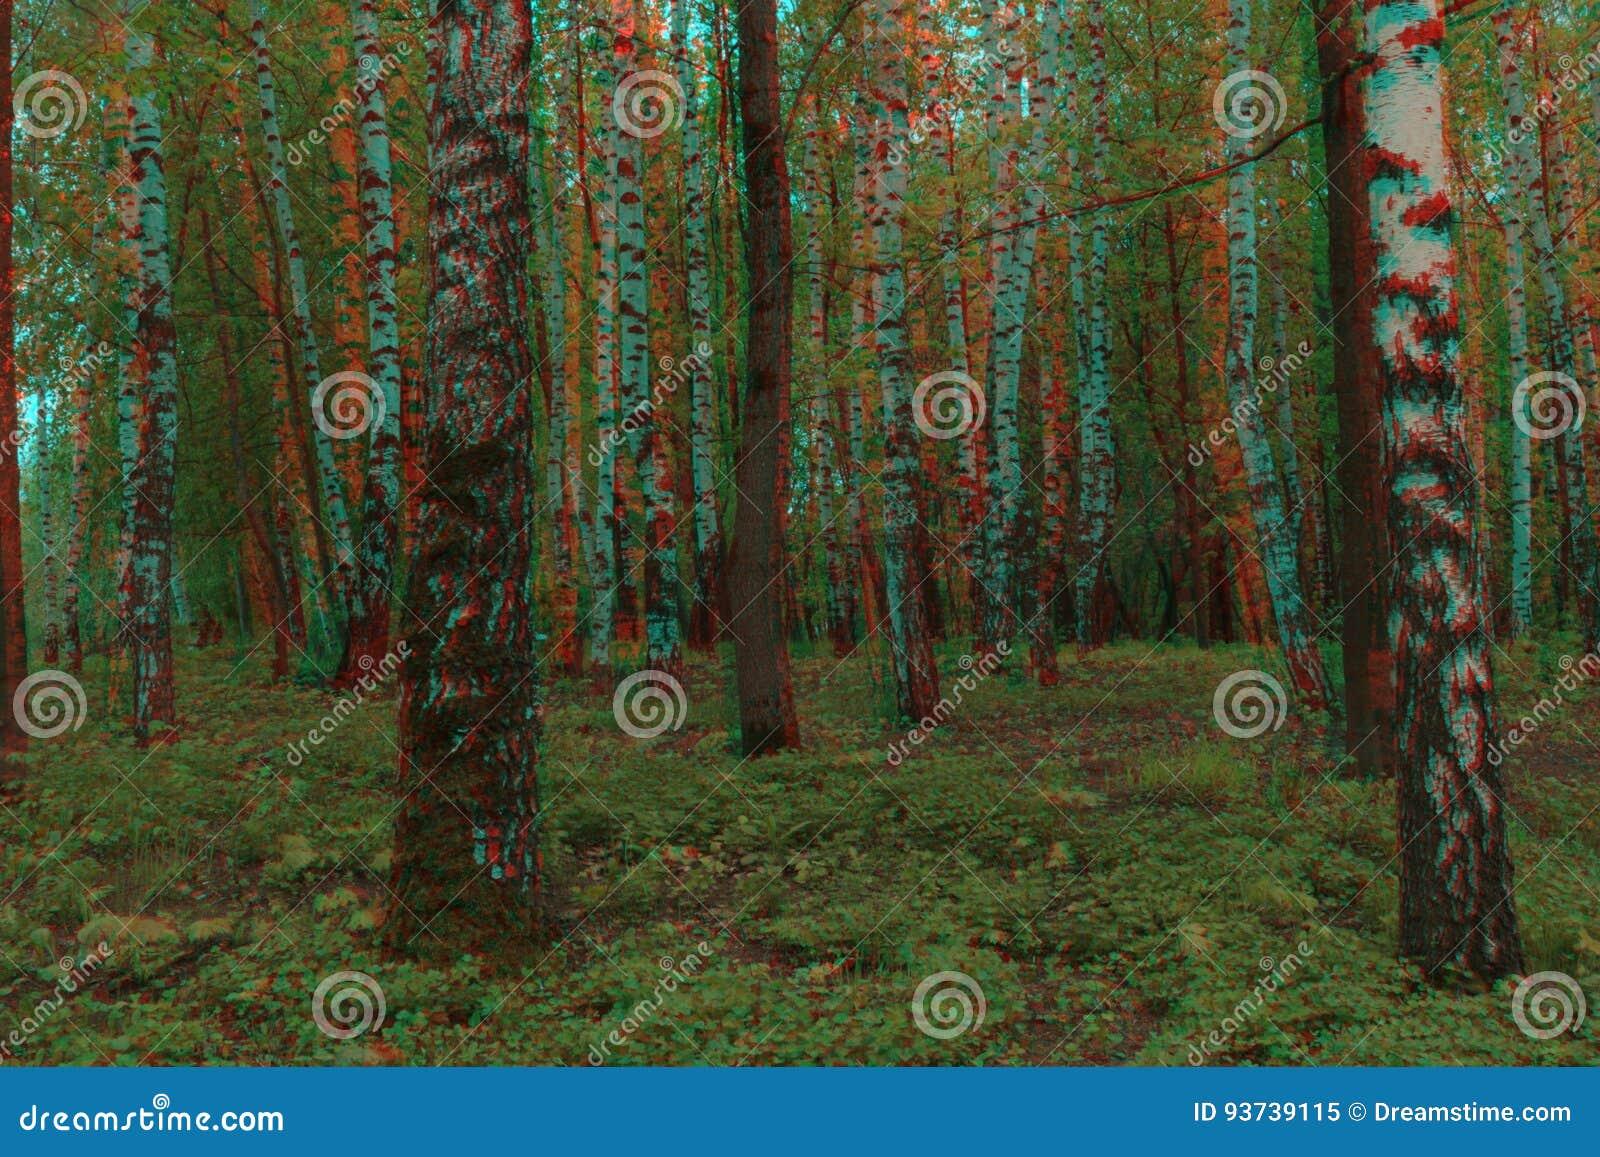 Summer forest anaglyph